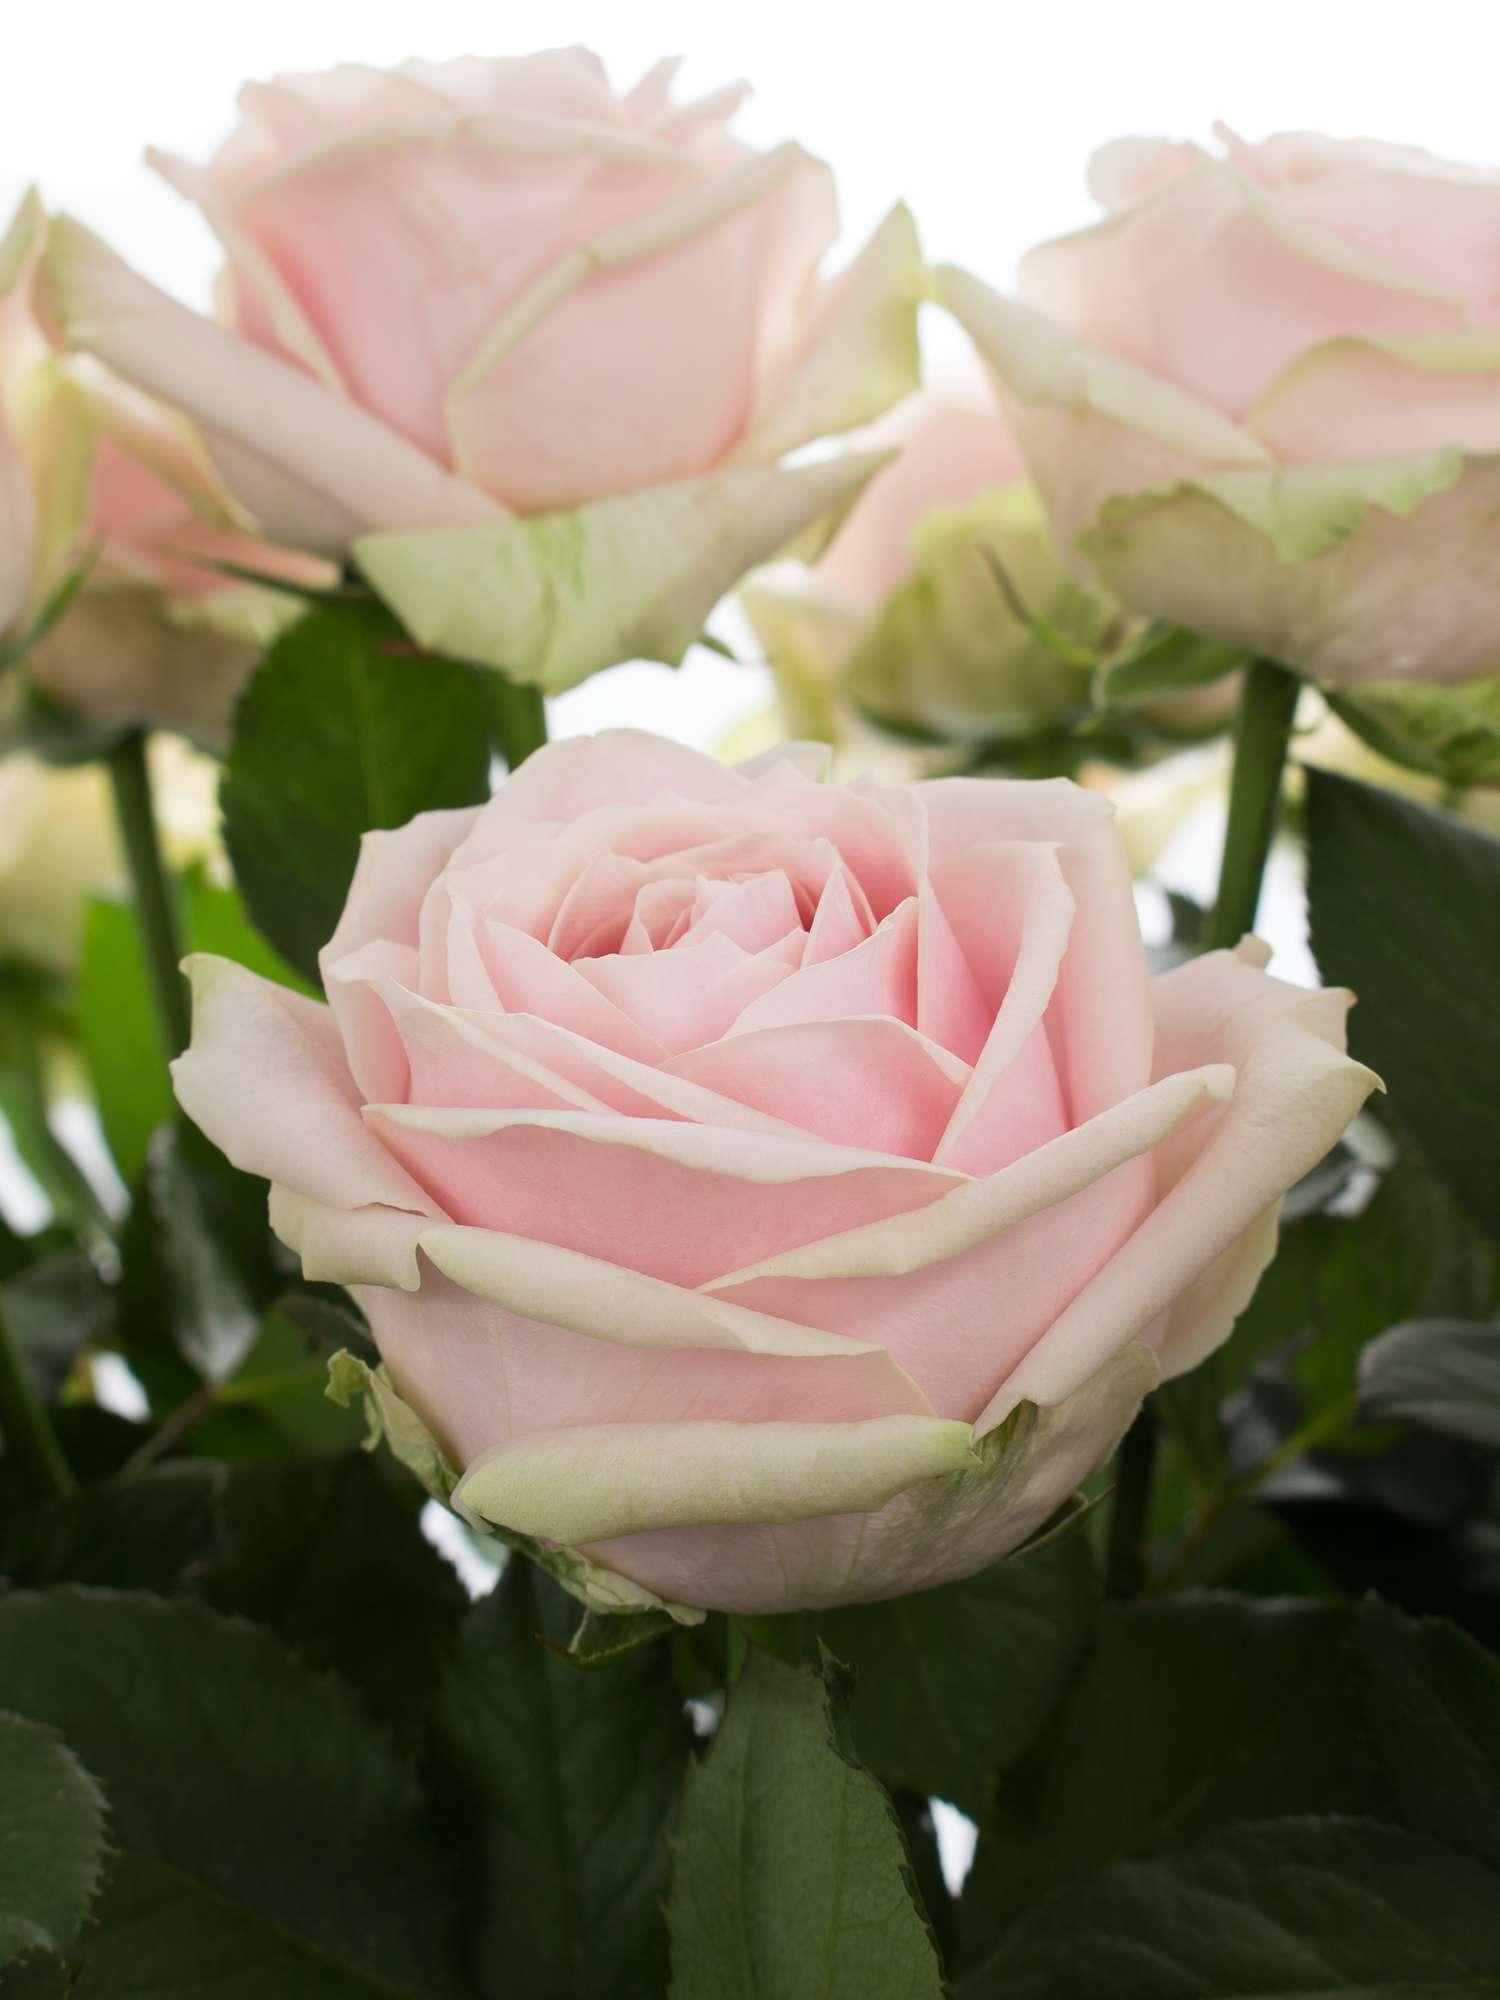 rosen sweet avalanche rosa bestellen blumigo. Black Bedroom Furniture Sets. Home Design Ideas